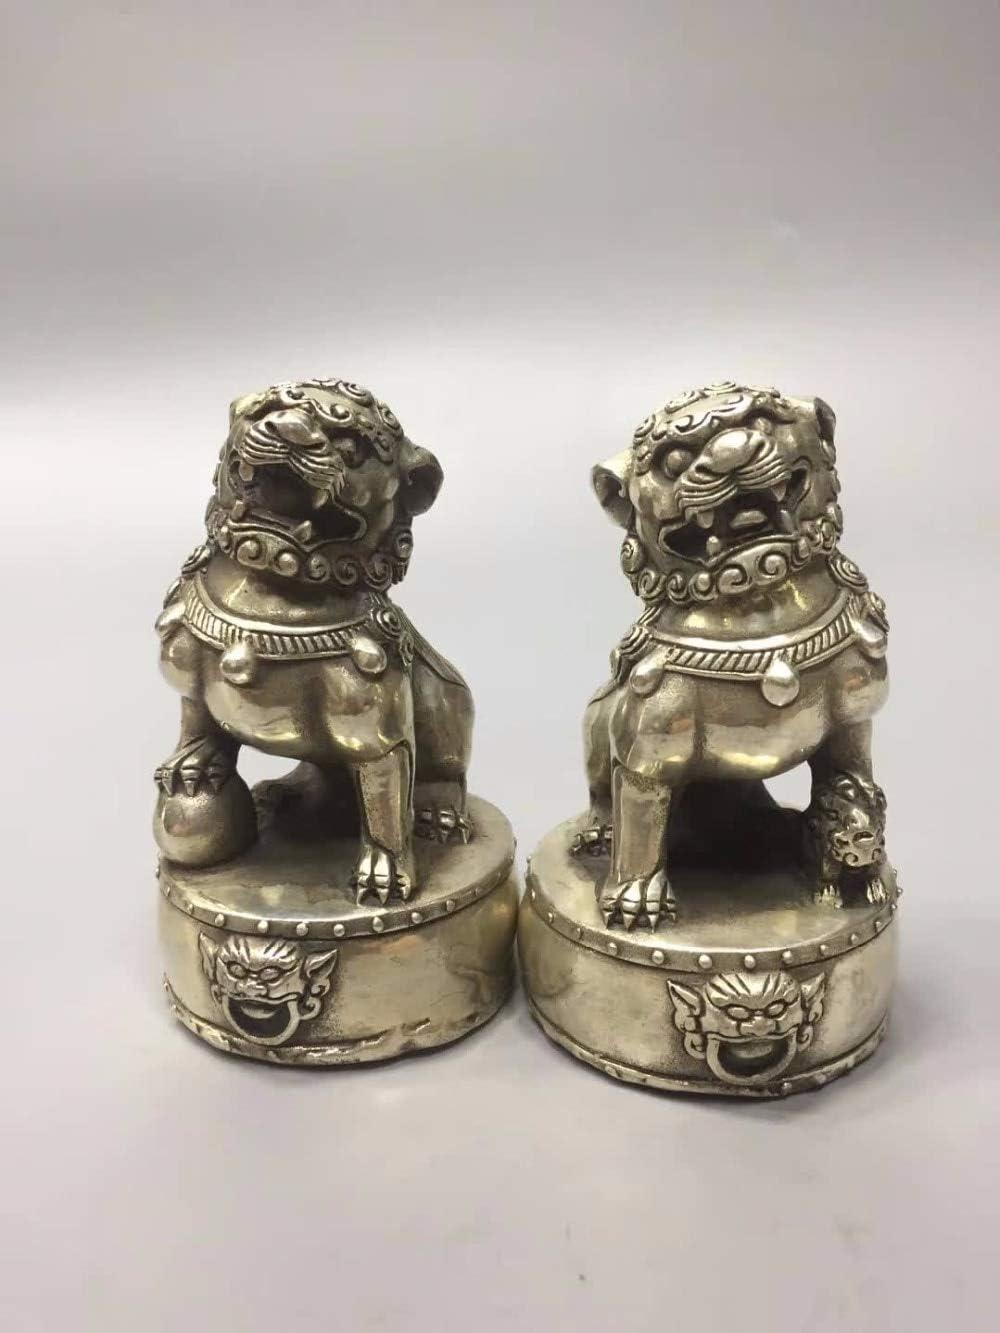 ZAMTAC Collection 1 Pair Tibet Silver Lion Statue,Home/Office Desk Decoration Fu Foo Dog Sculpture Metal Crafts